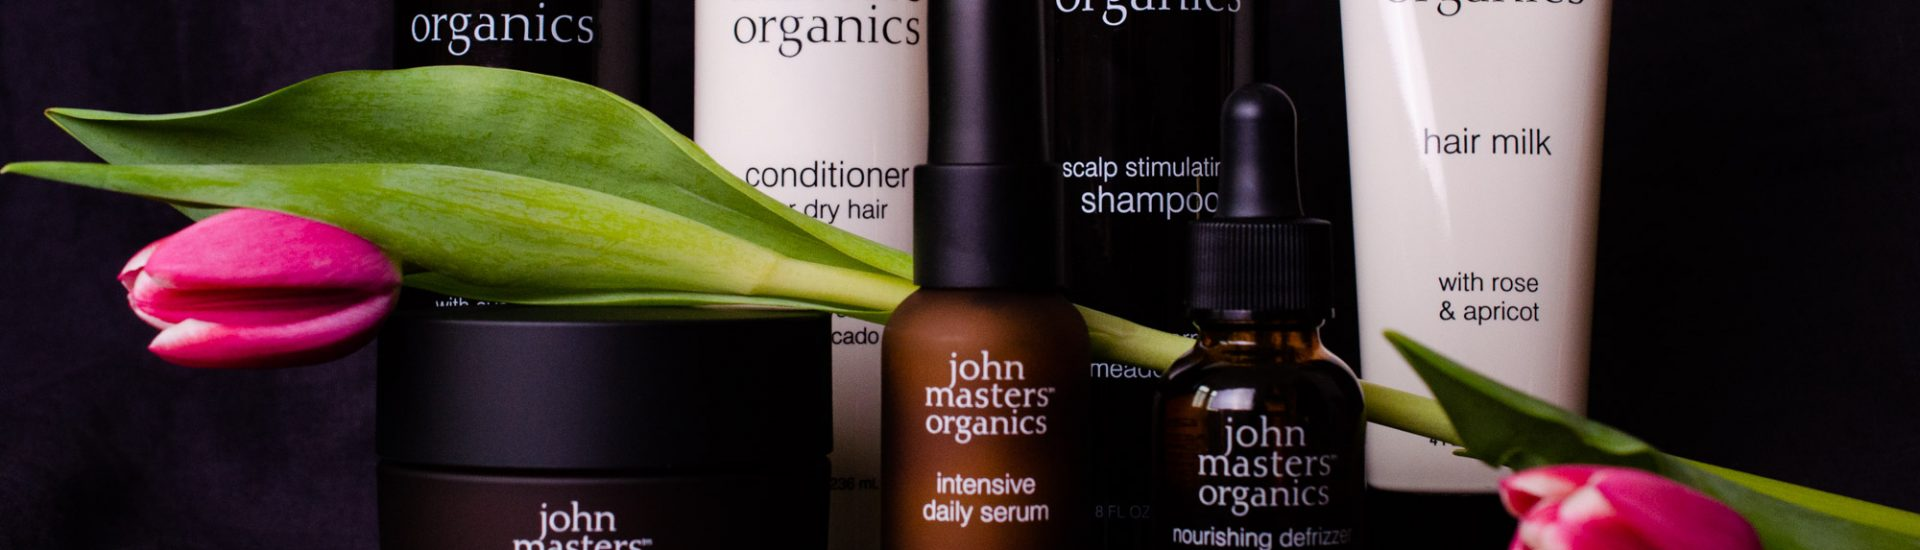 John Masters Organics haircare and skincare